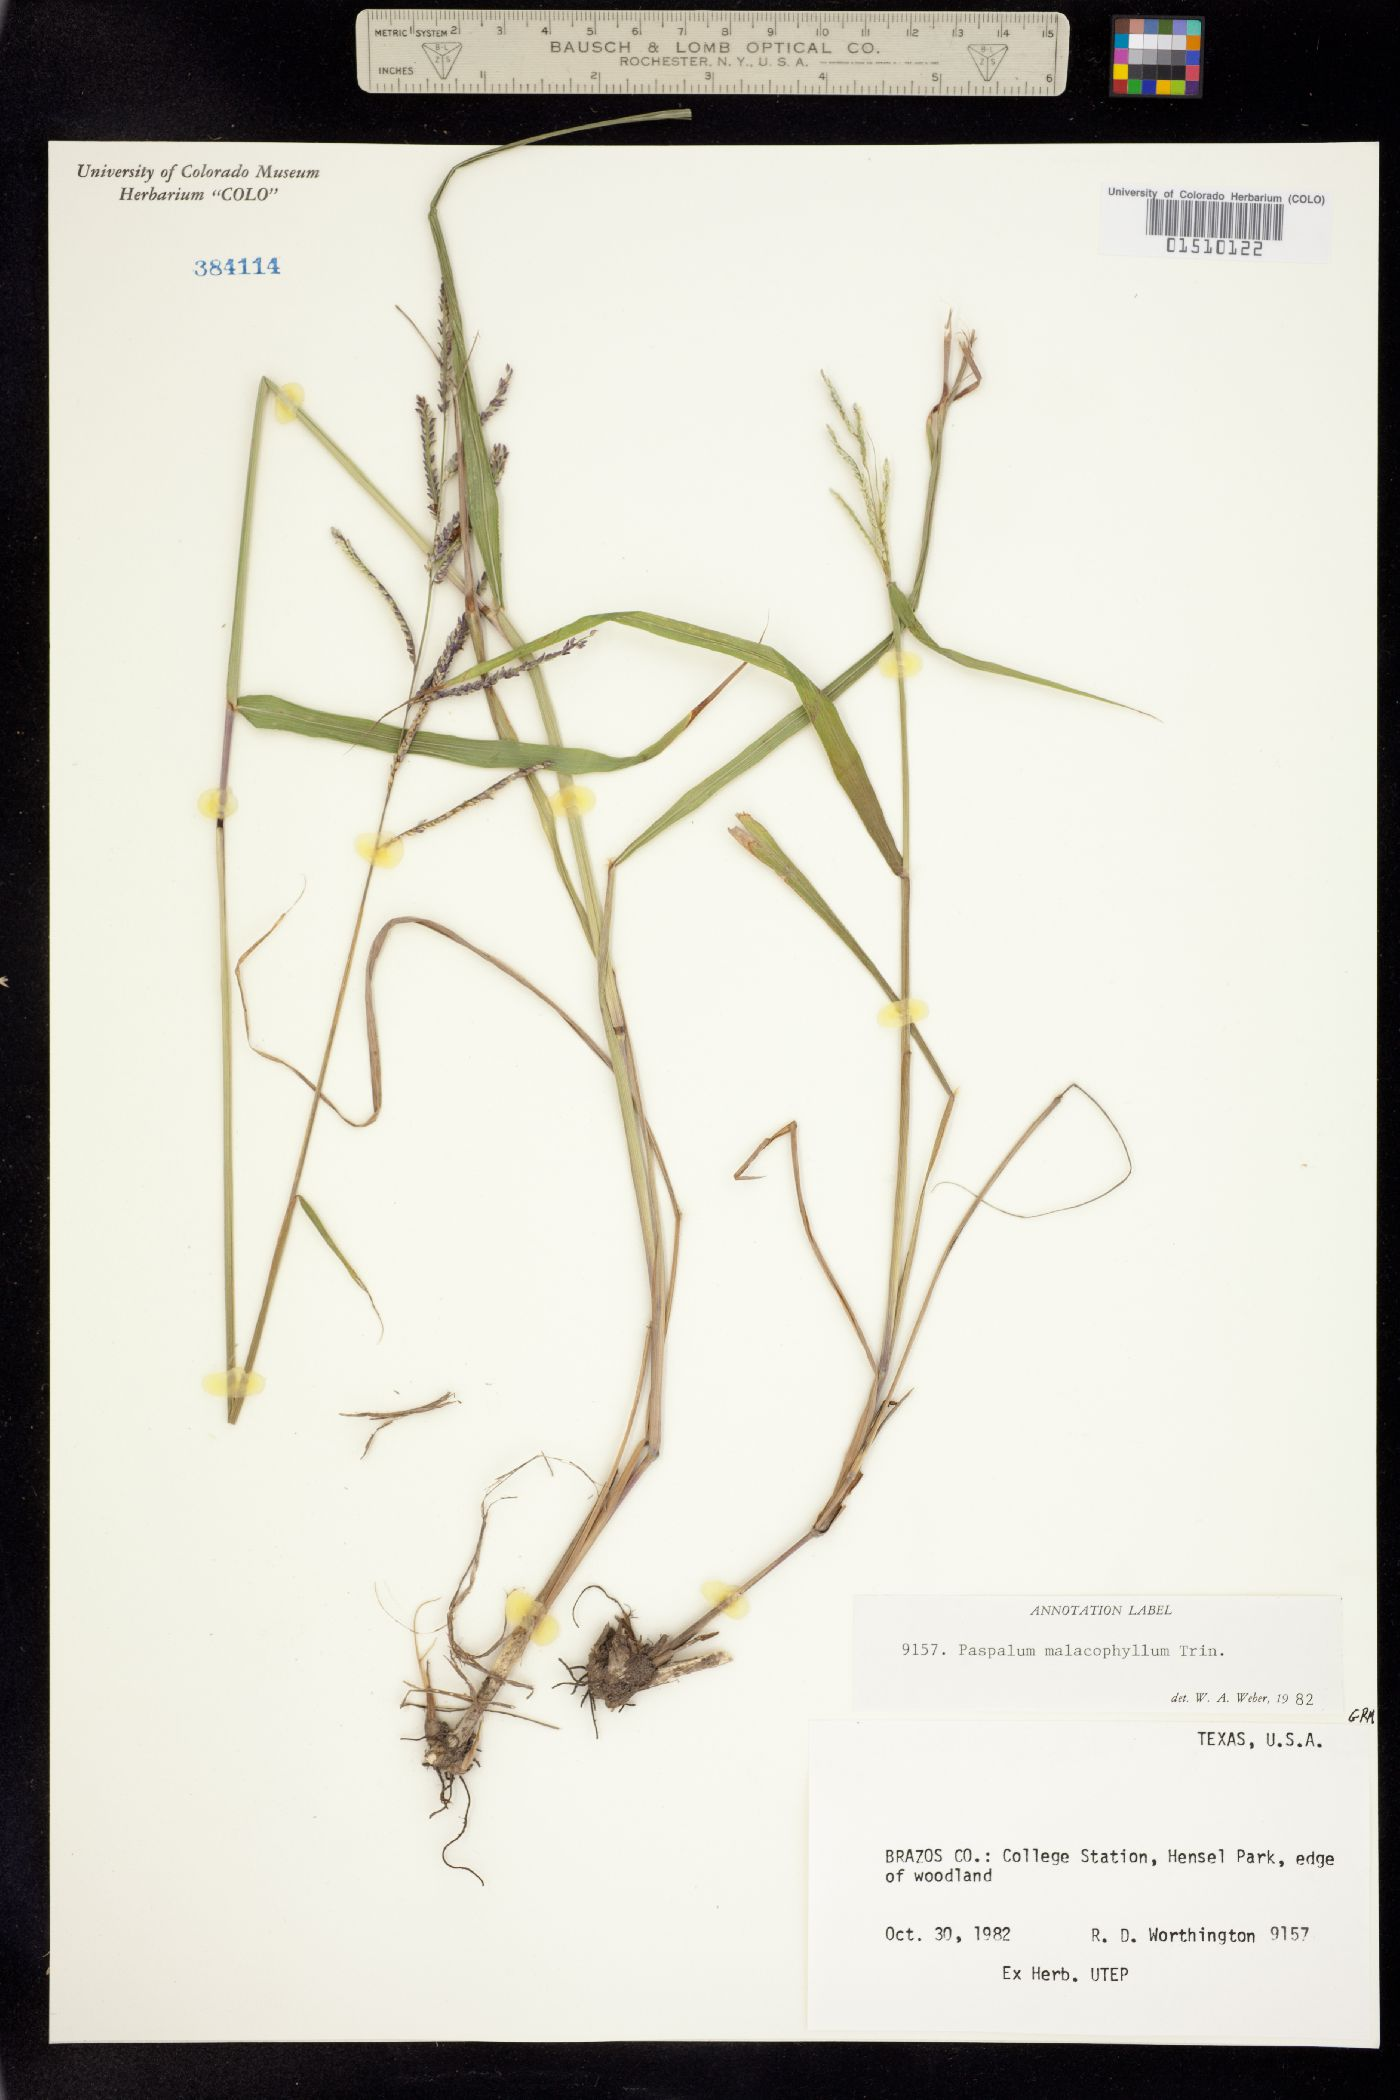 Paspalum malacophyllum image